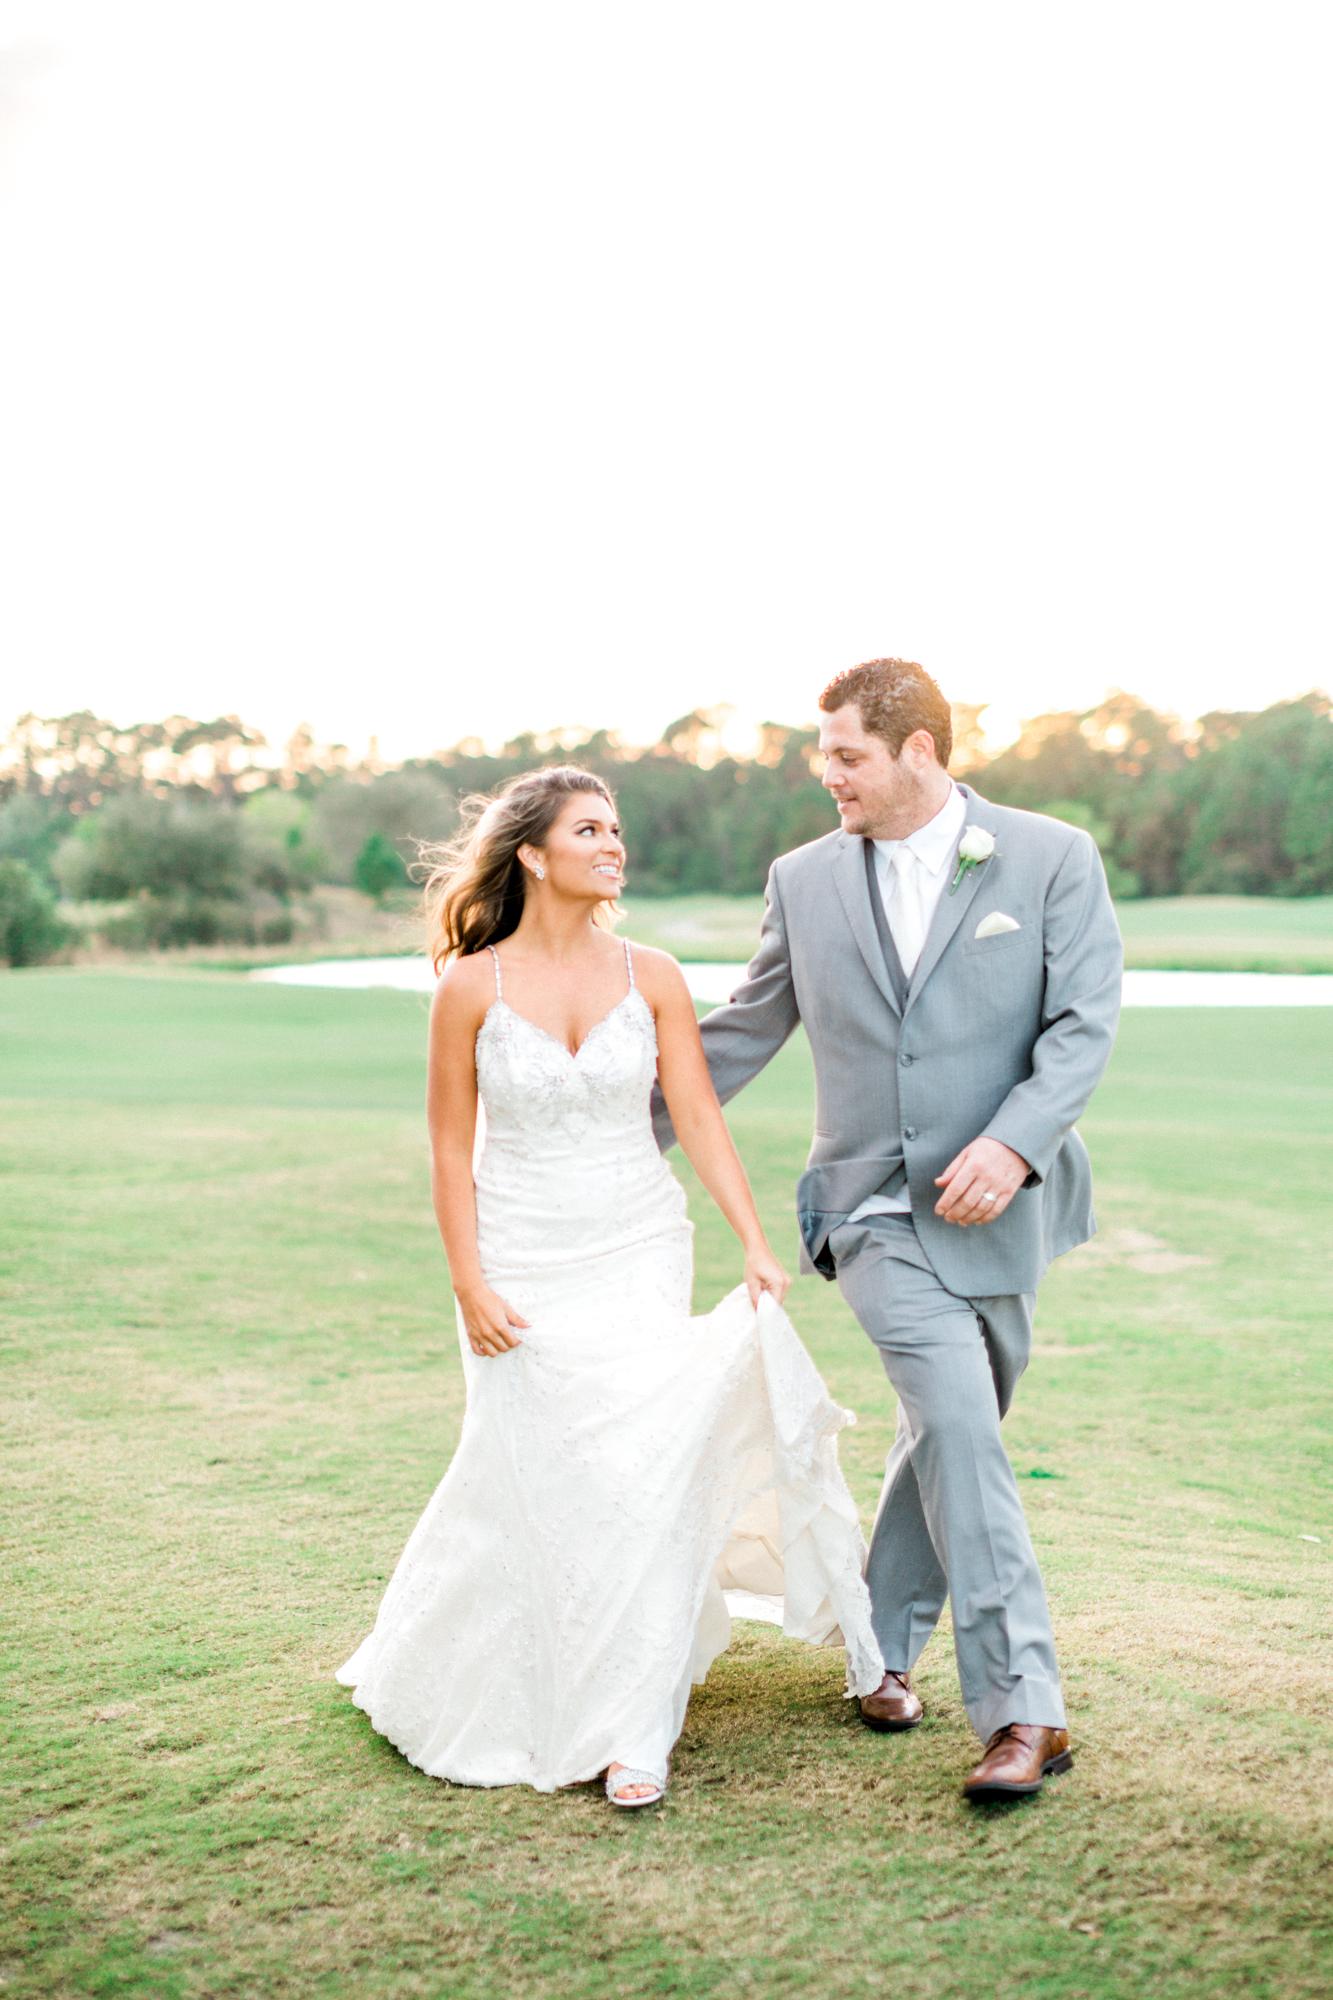 jessica-bellinger-photography-harmony-golf-preserve-wedding-photos-9426.jpg